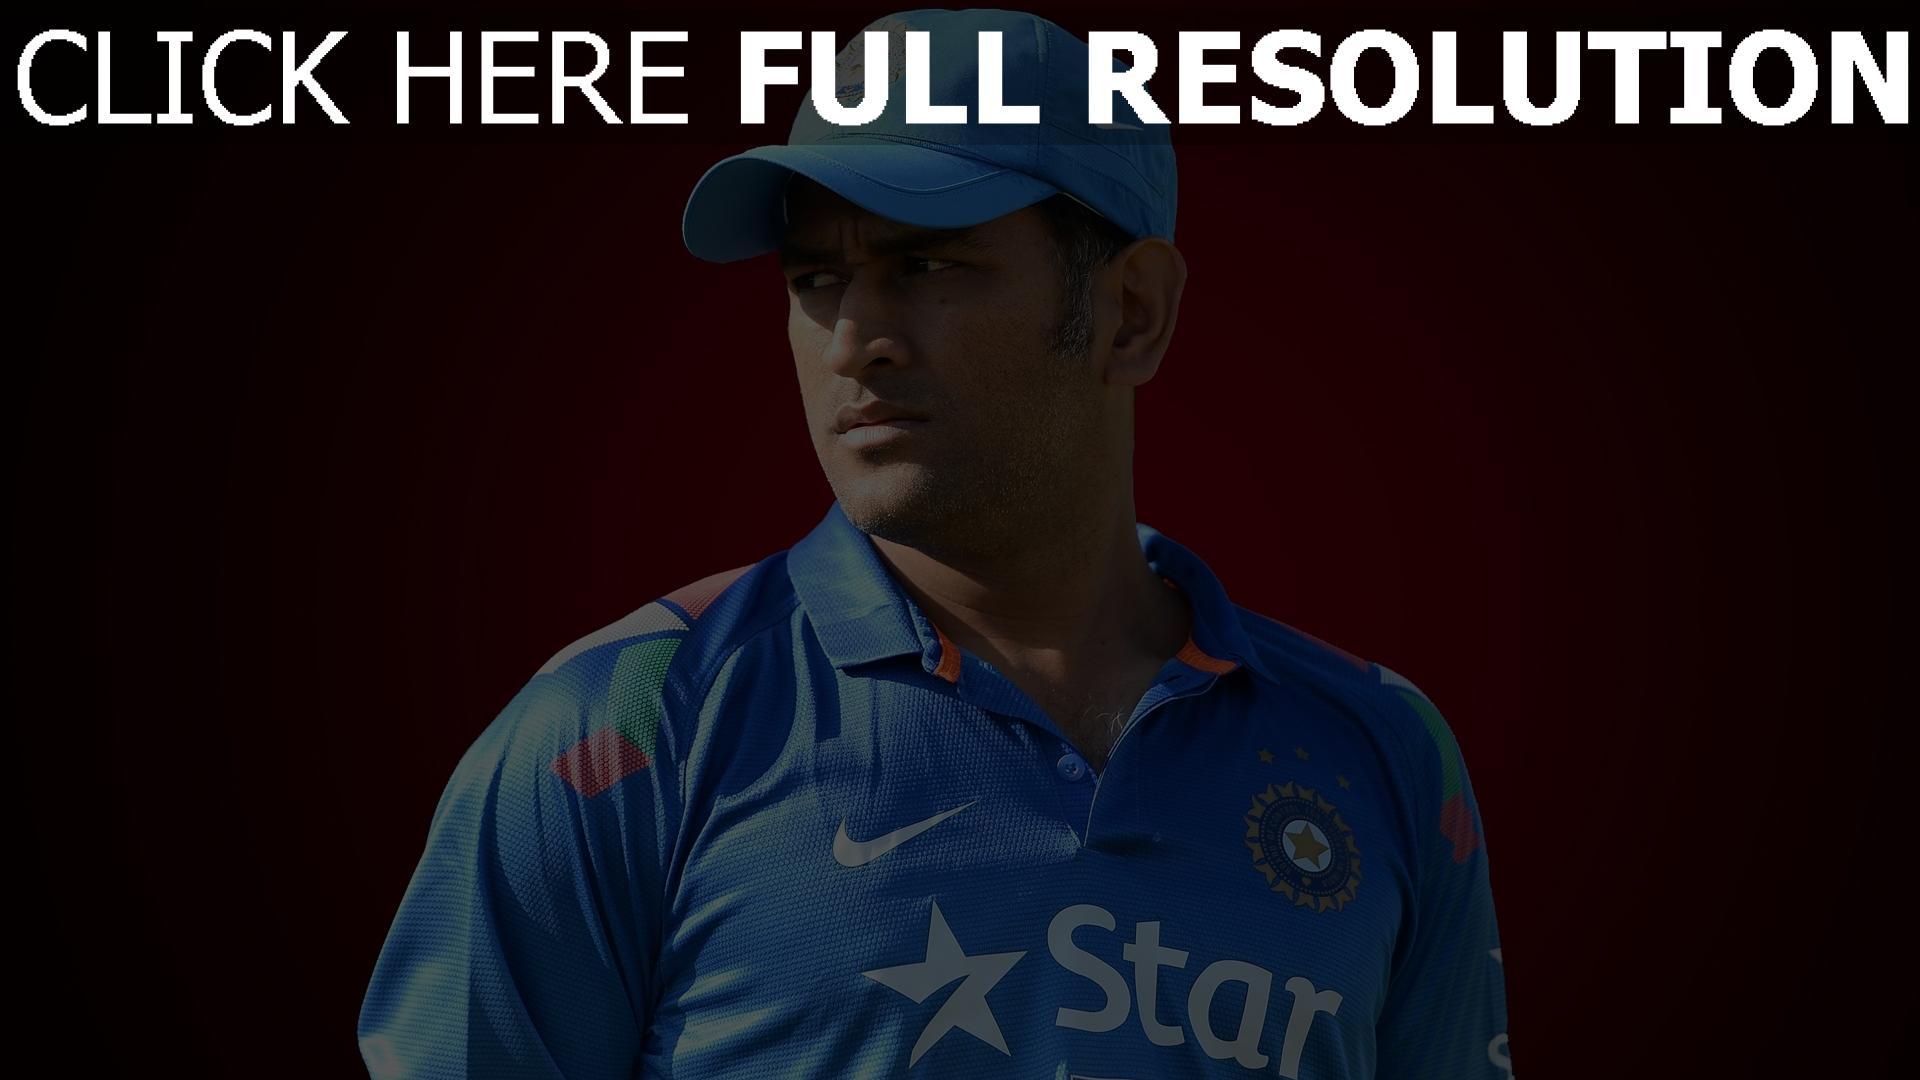 Hd Hintergrundbilder Cricket Sportler Mahendra Singh Dhoni Desktop